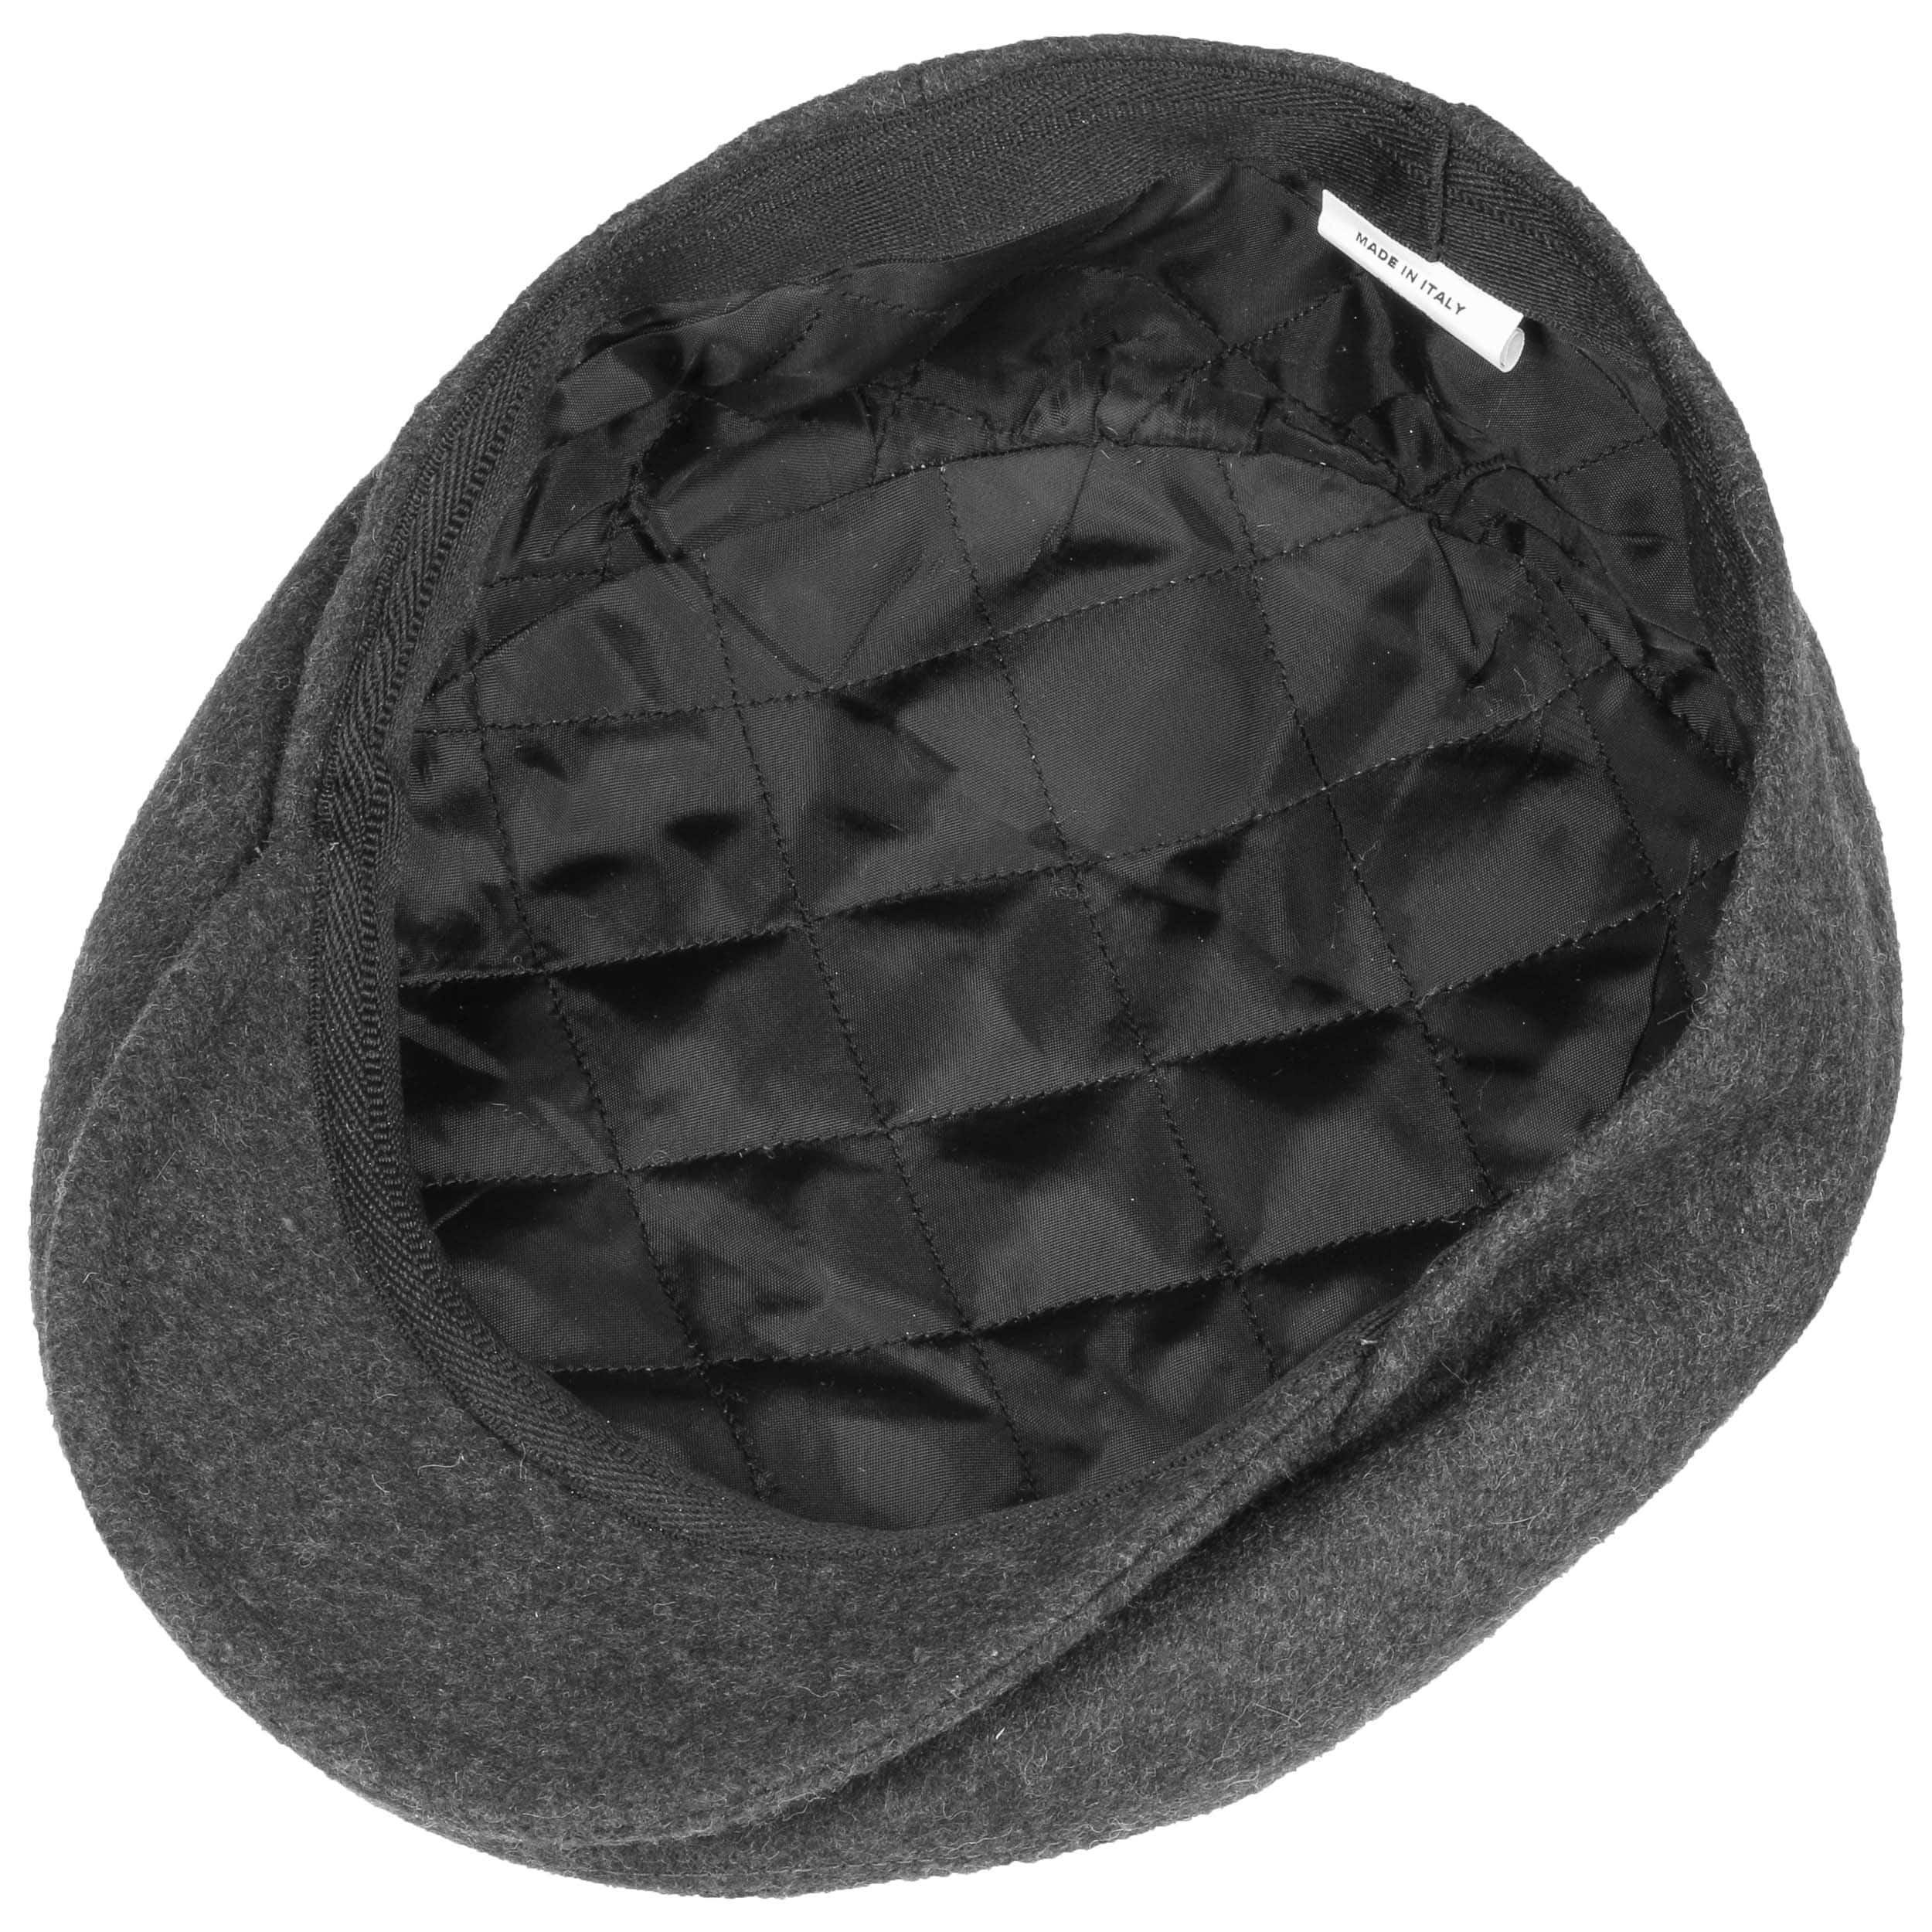 Gorra Gatsby Sport by Lipodo - Gorras - sombreroshop.es 696f9263081